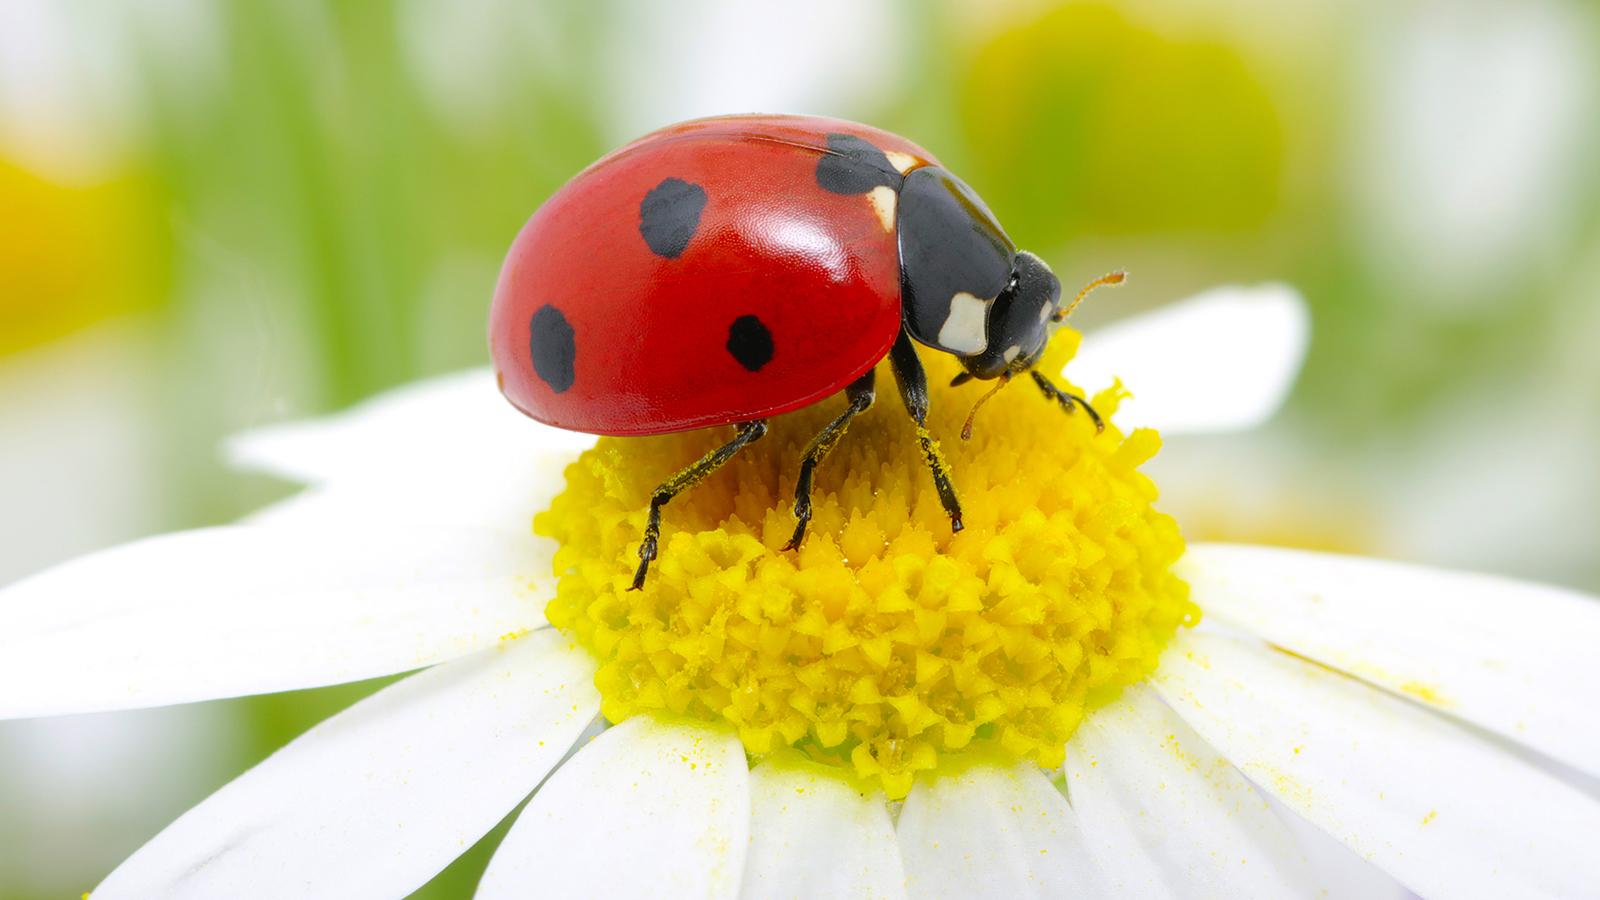 High Resolution Wallpaper | Ladybug 1600x900 px